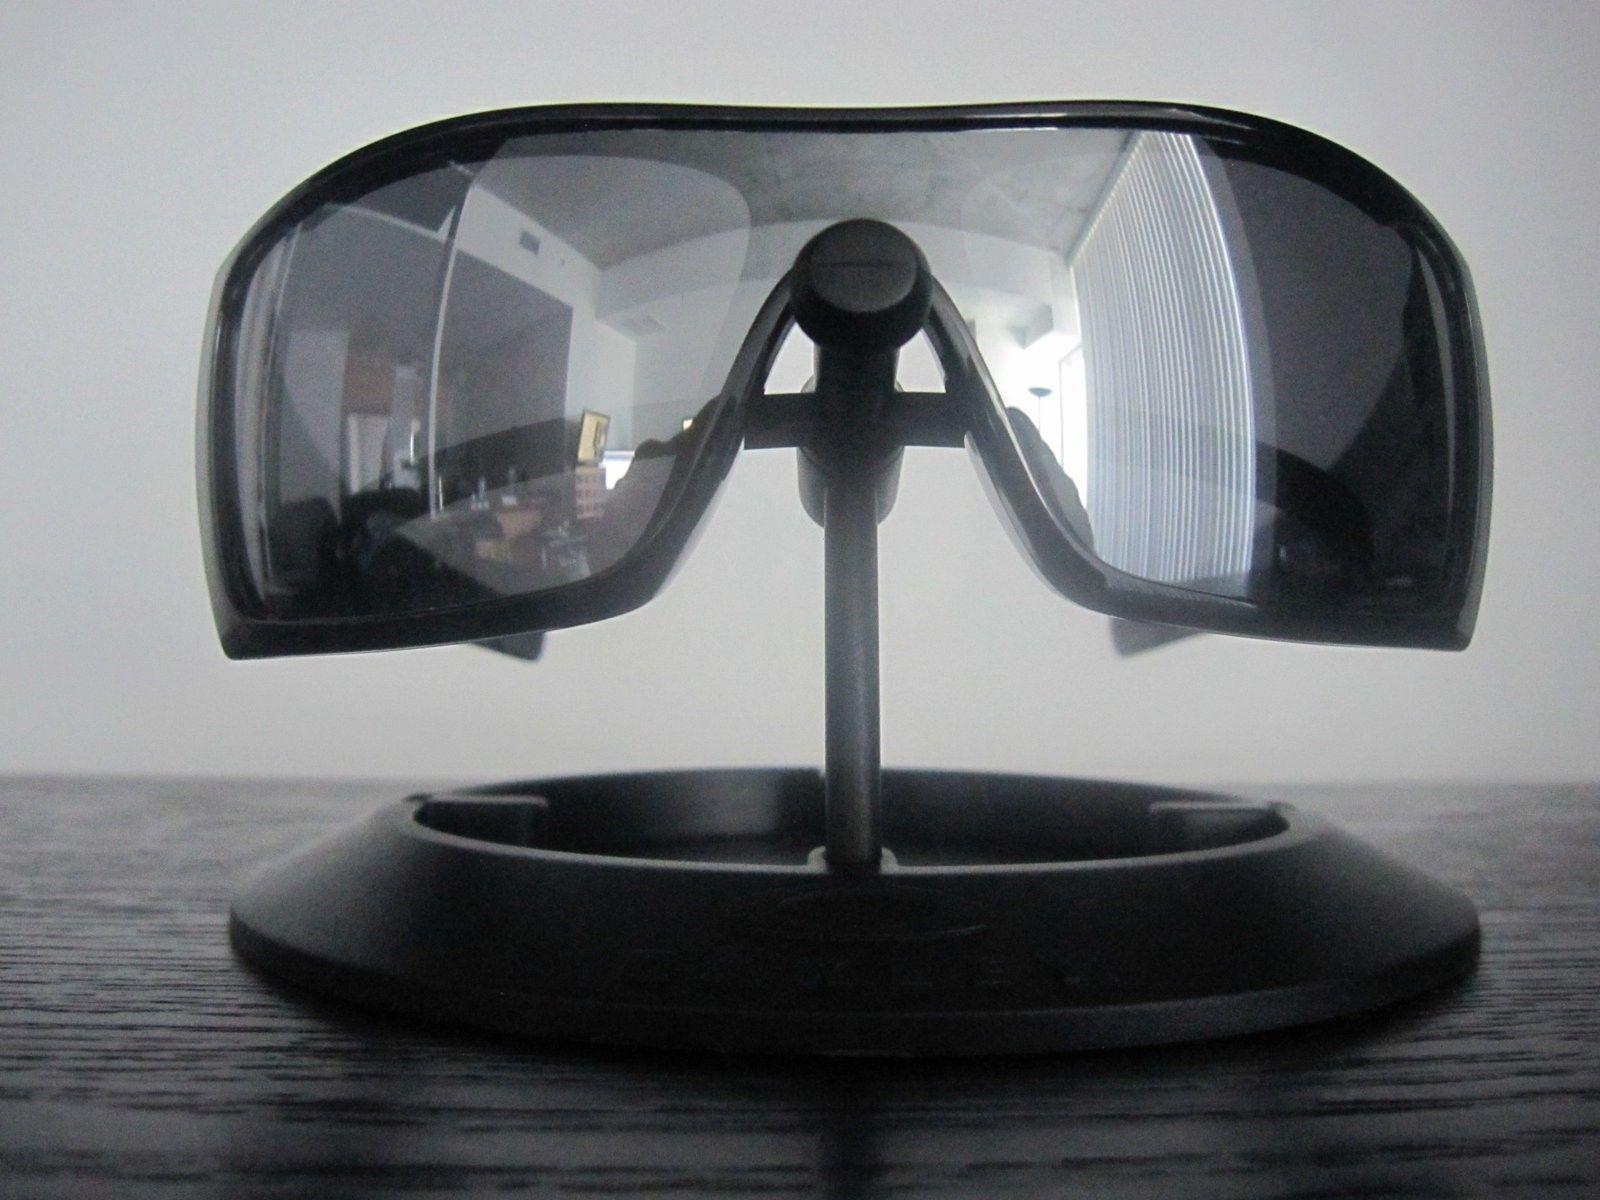 BNIB BATWOLF SKU # 9101-01 - Black Ink / Black Iridium - GONE - IMG_5056.JPG